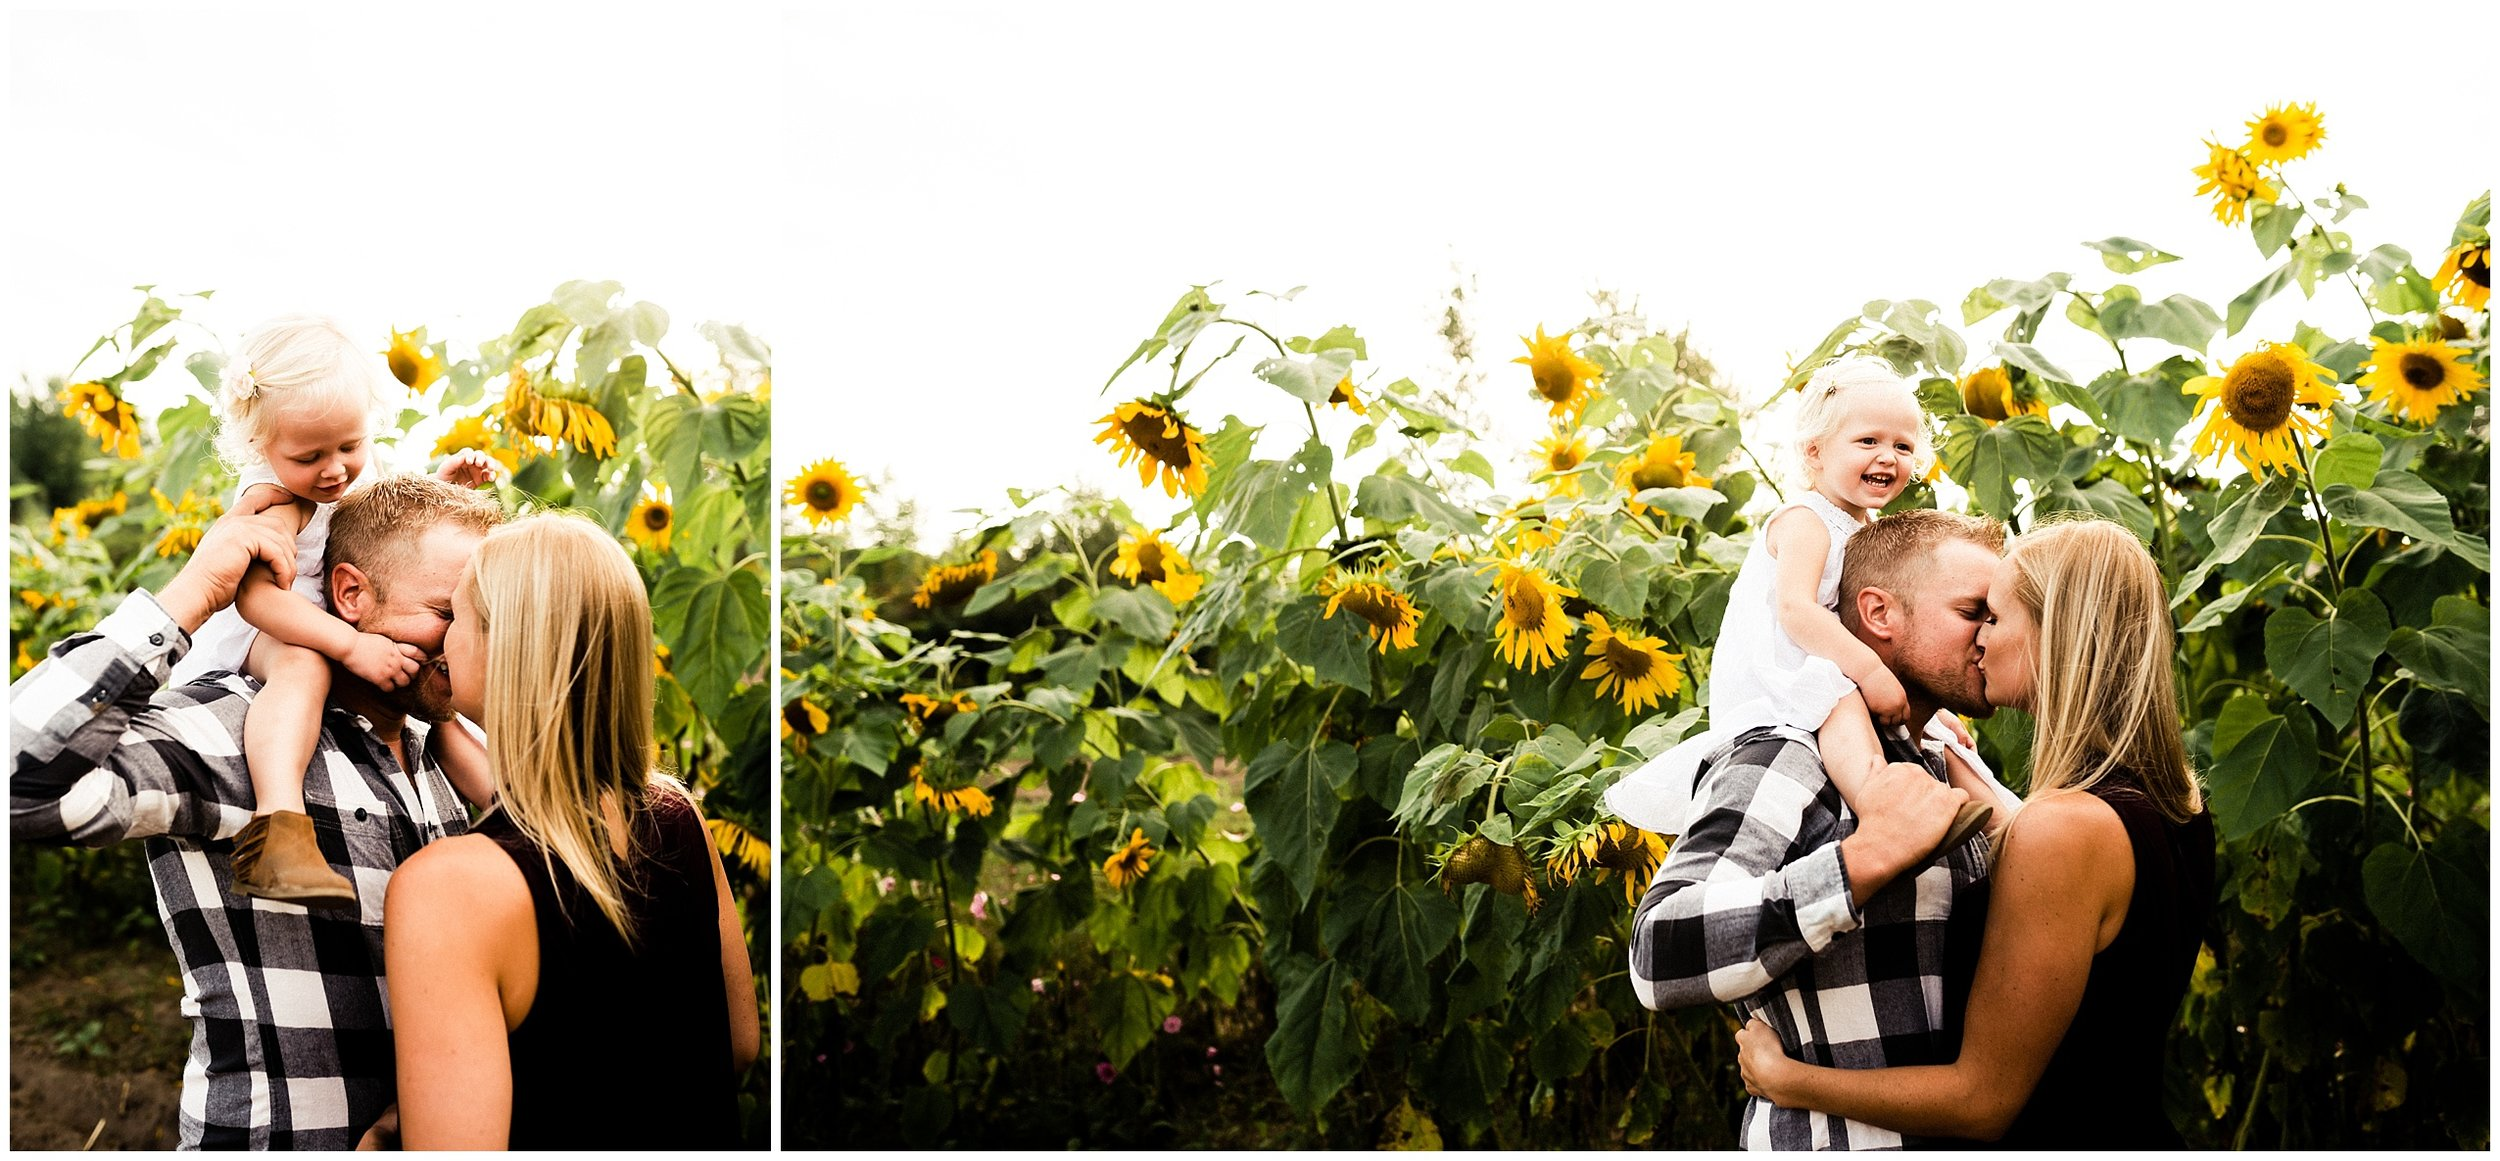 Ben + Haily | Engaged #kyleepaigephotography_1131.jpg